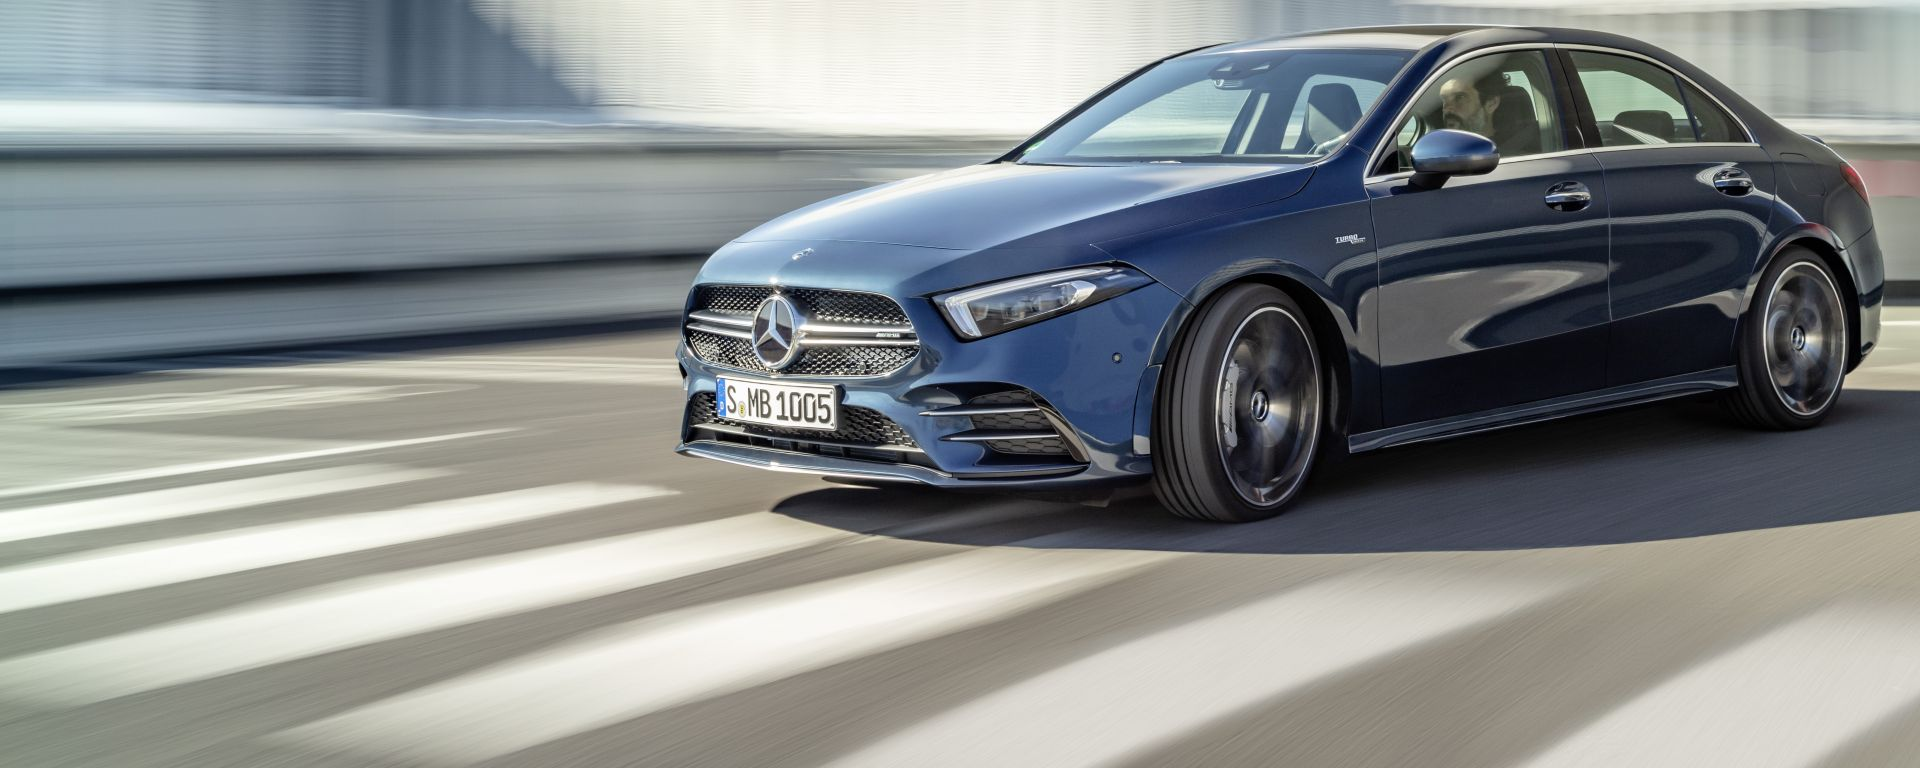 Nuova Mercedes-AMG A 35 Sedan 2019